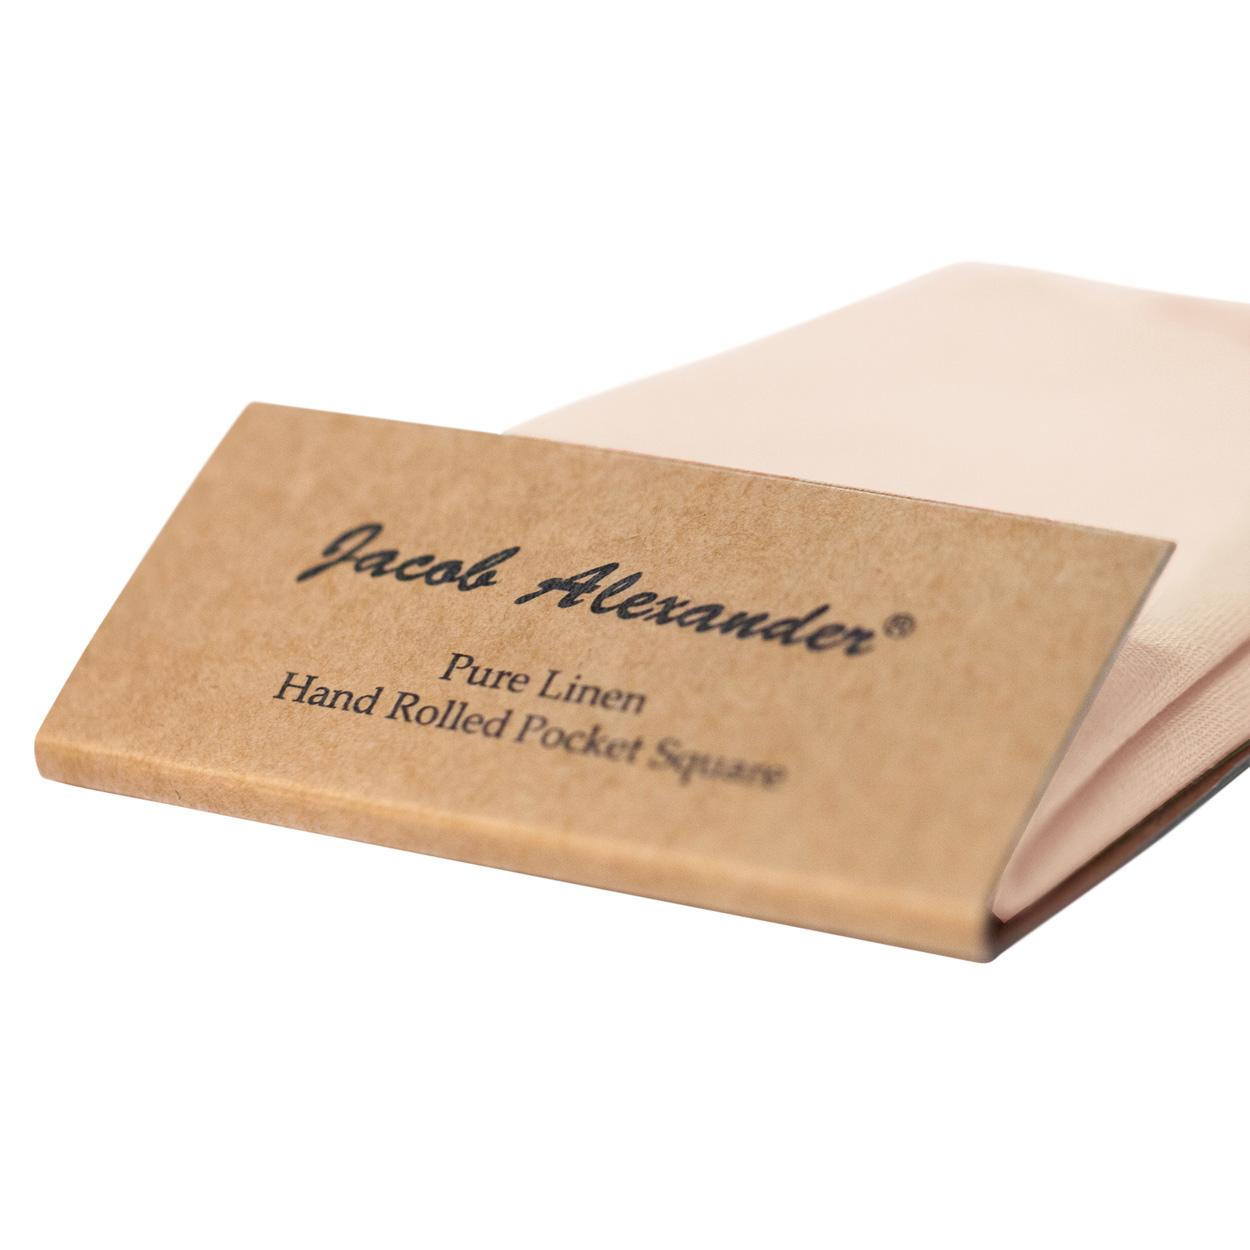 Jacob-Alexander-Linen-Handrolled-15-034-x-15-034-Pocket-Square-Hanky thumbnail 20